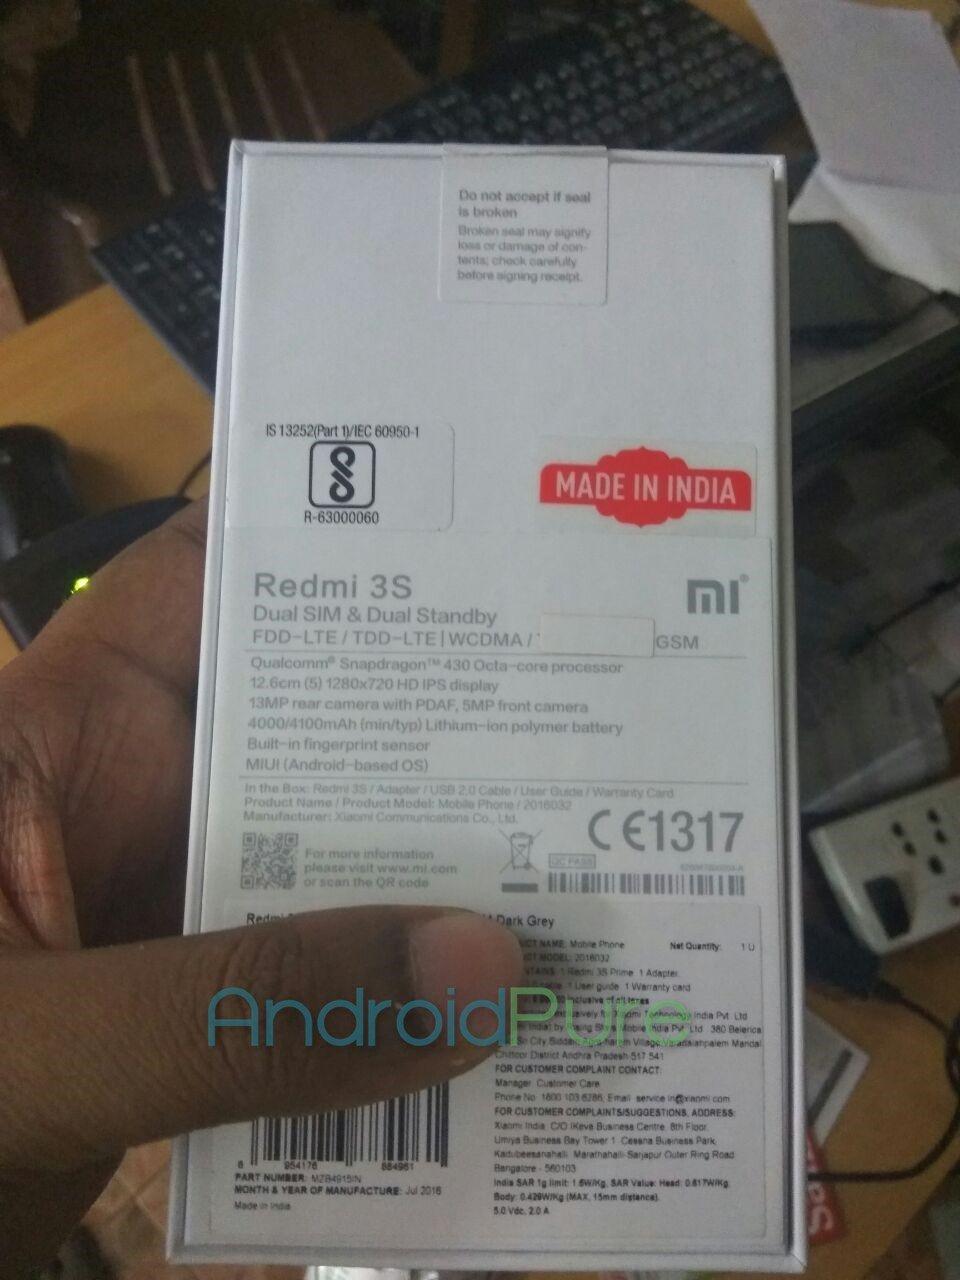 Redmi 3S Prime handson 3 Redmi 3S Prime hands on photos and quick review 1